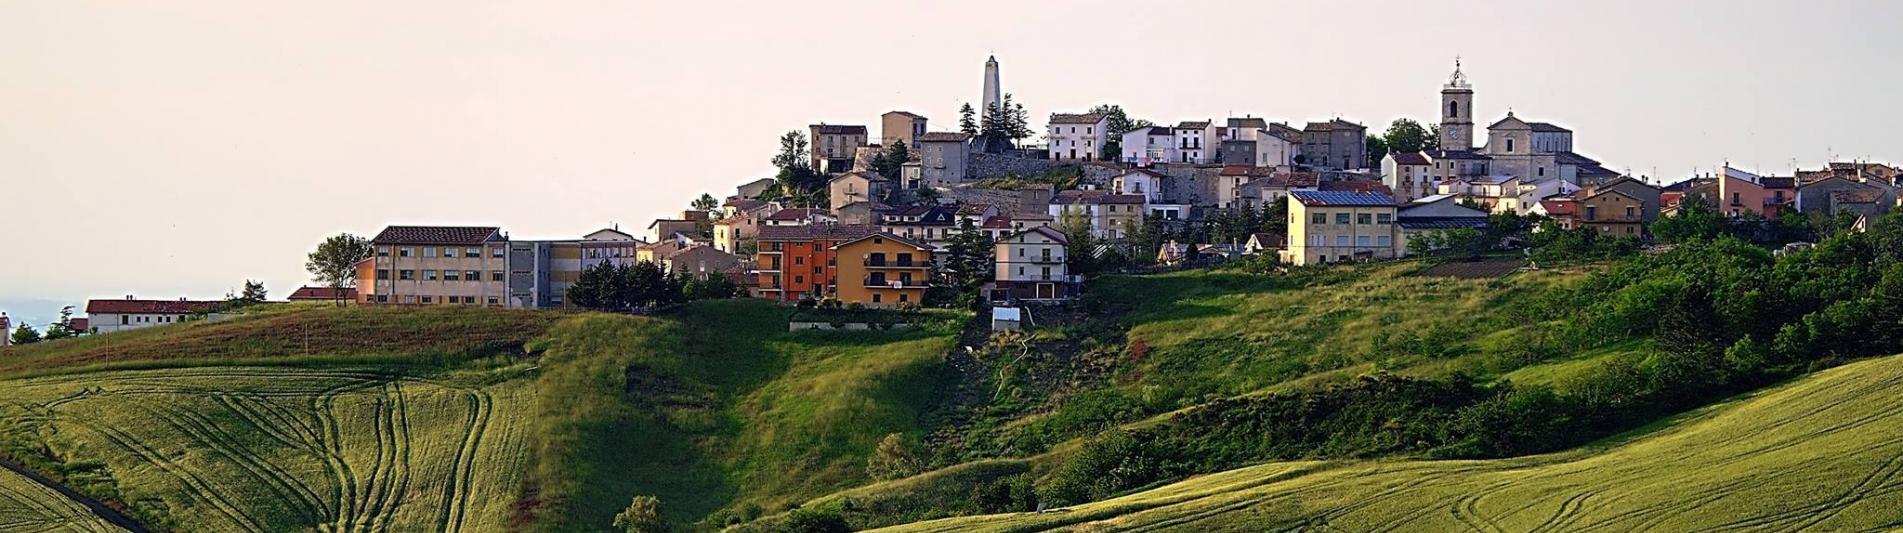 Panoramica di Torricella Peligna